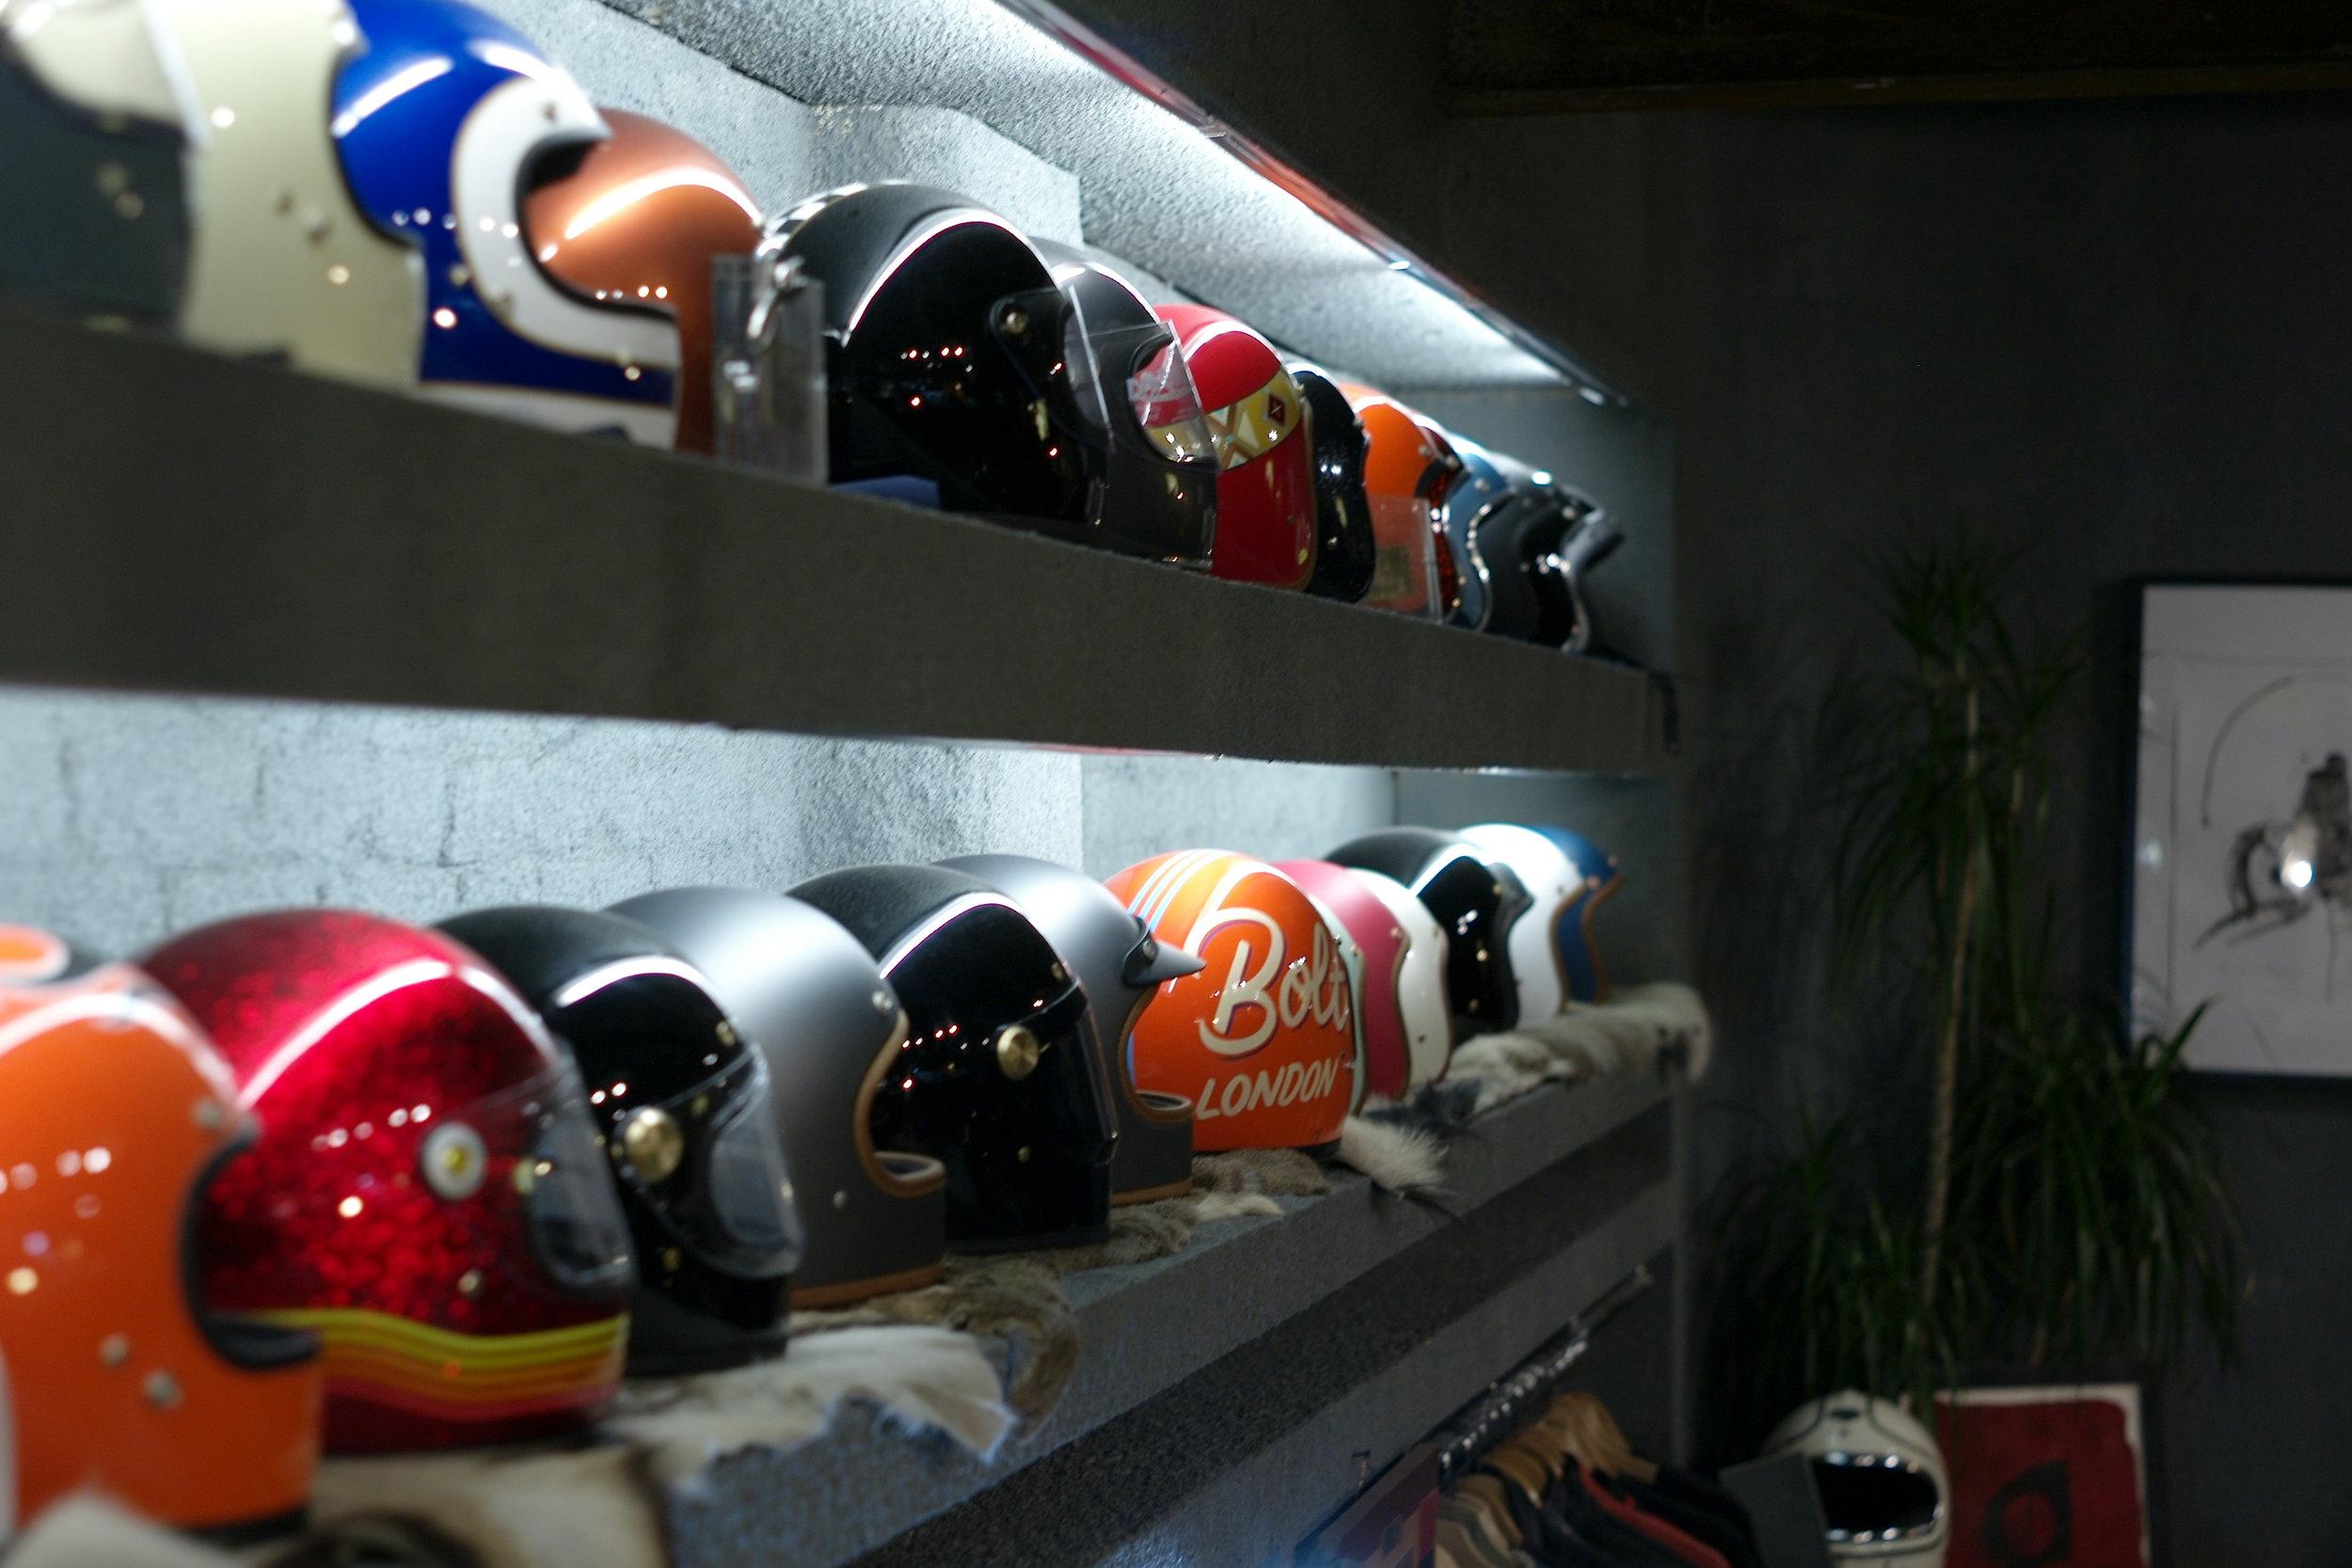 Casual snob - Bolt London Store Helmets Hedon Bell Biltwell.JPG